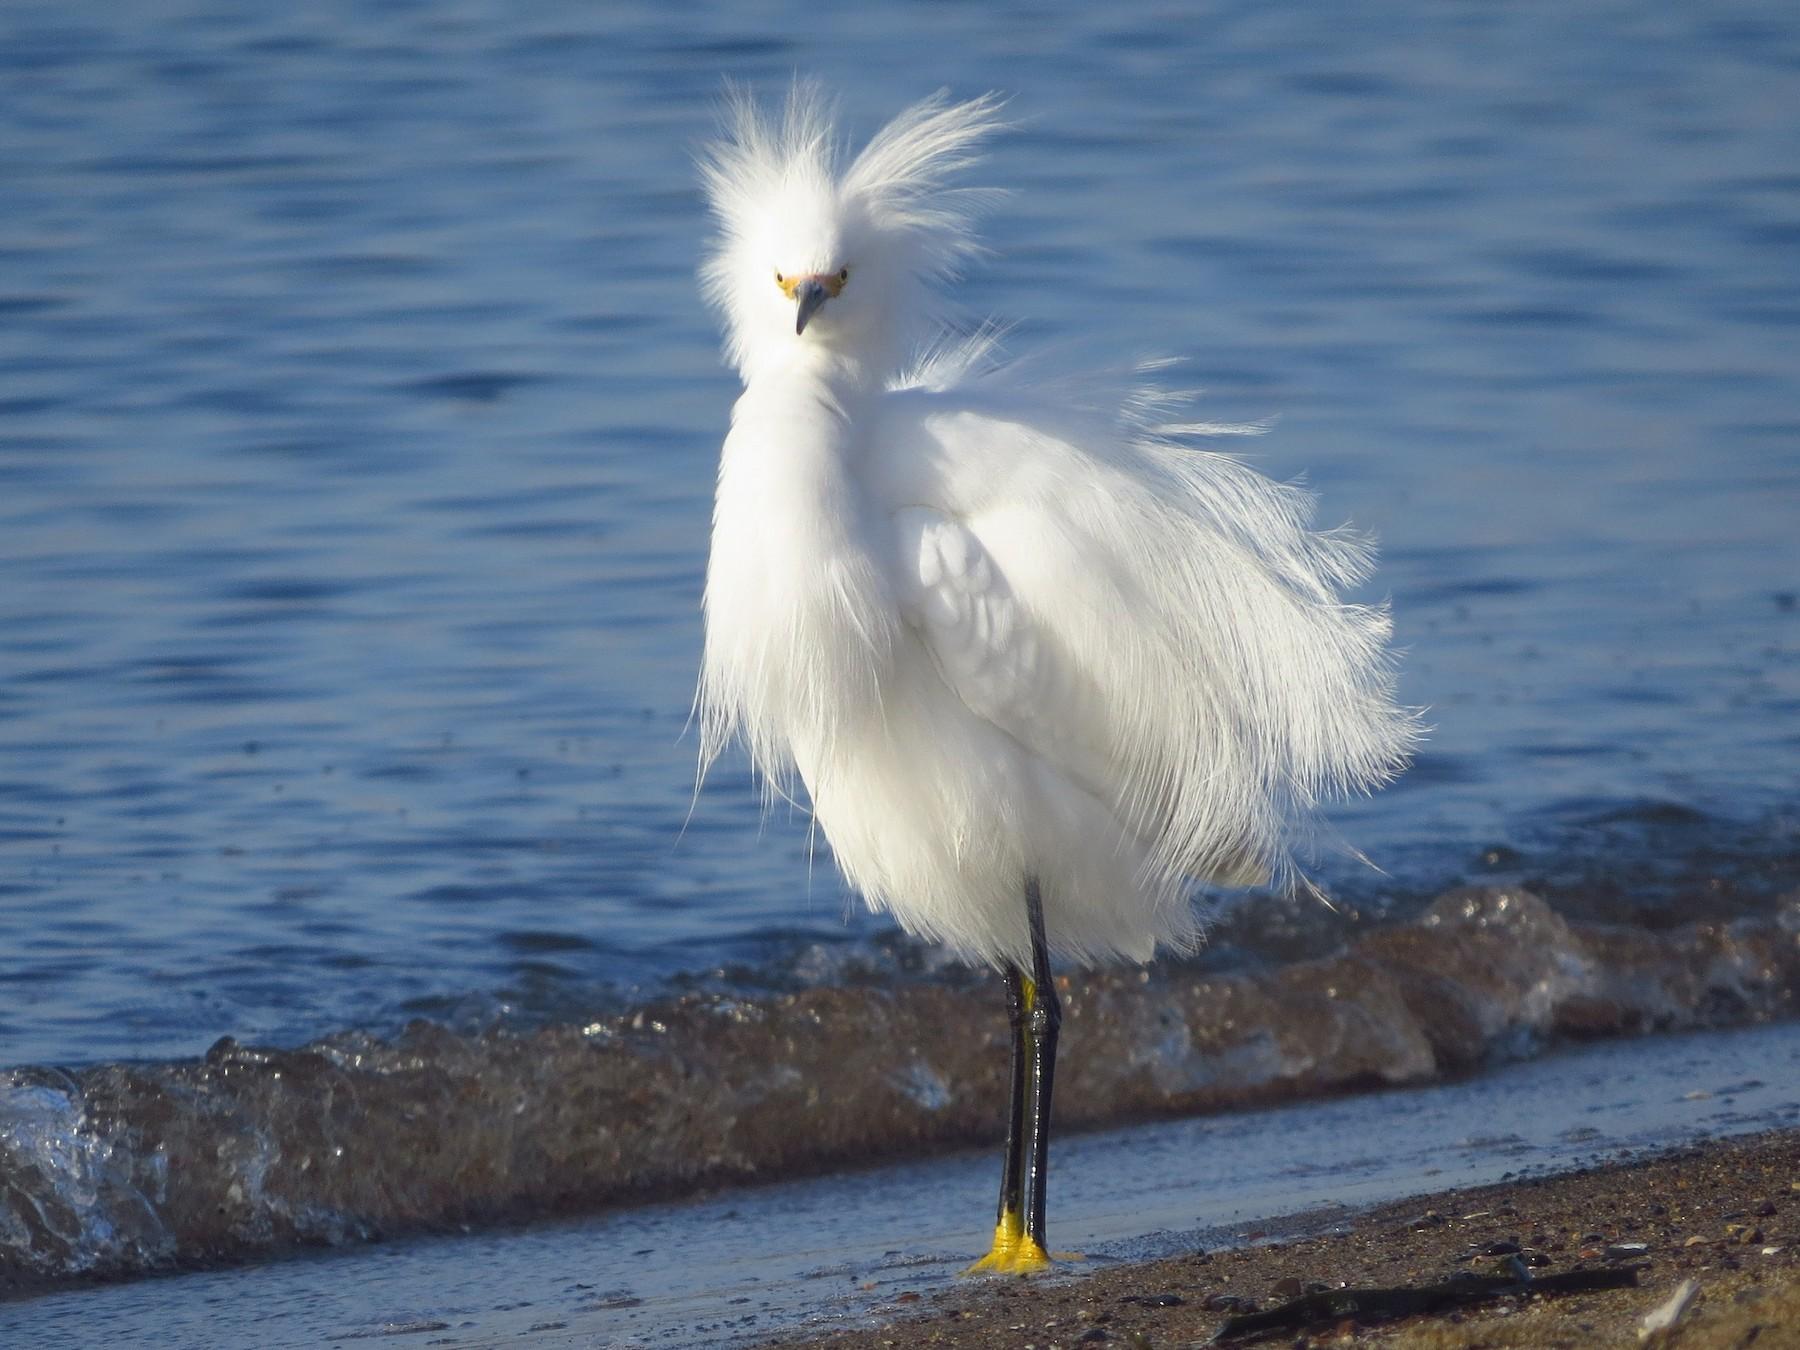 Snowy Egret - Ben Frueh